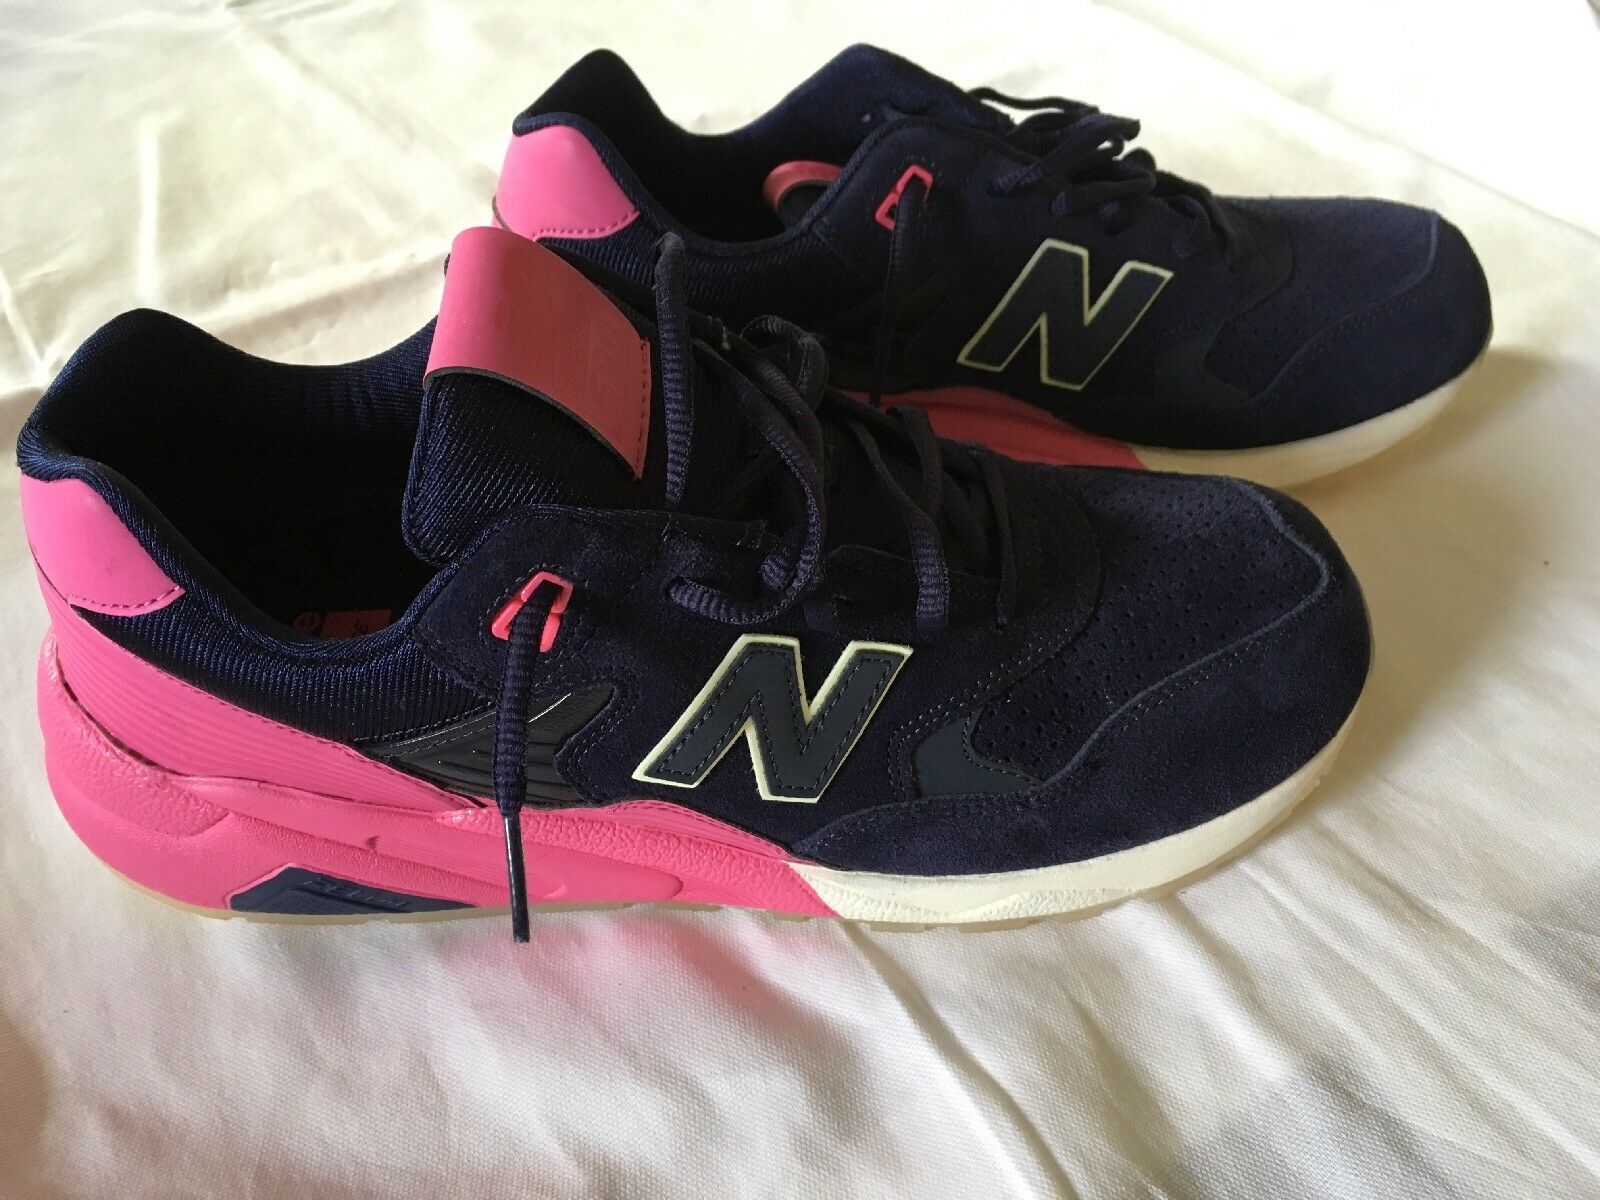 New Balance 580 Rev Lite Blue/ Pink Size 9.5